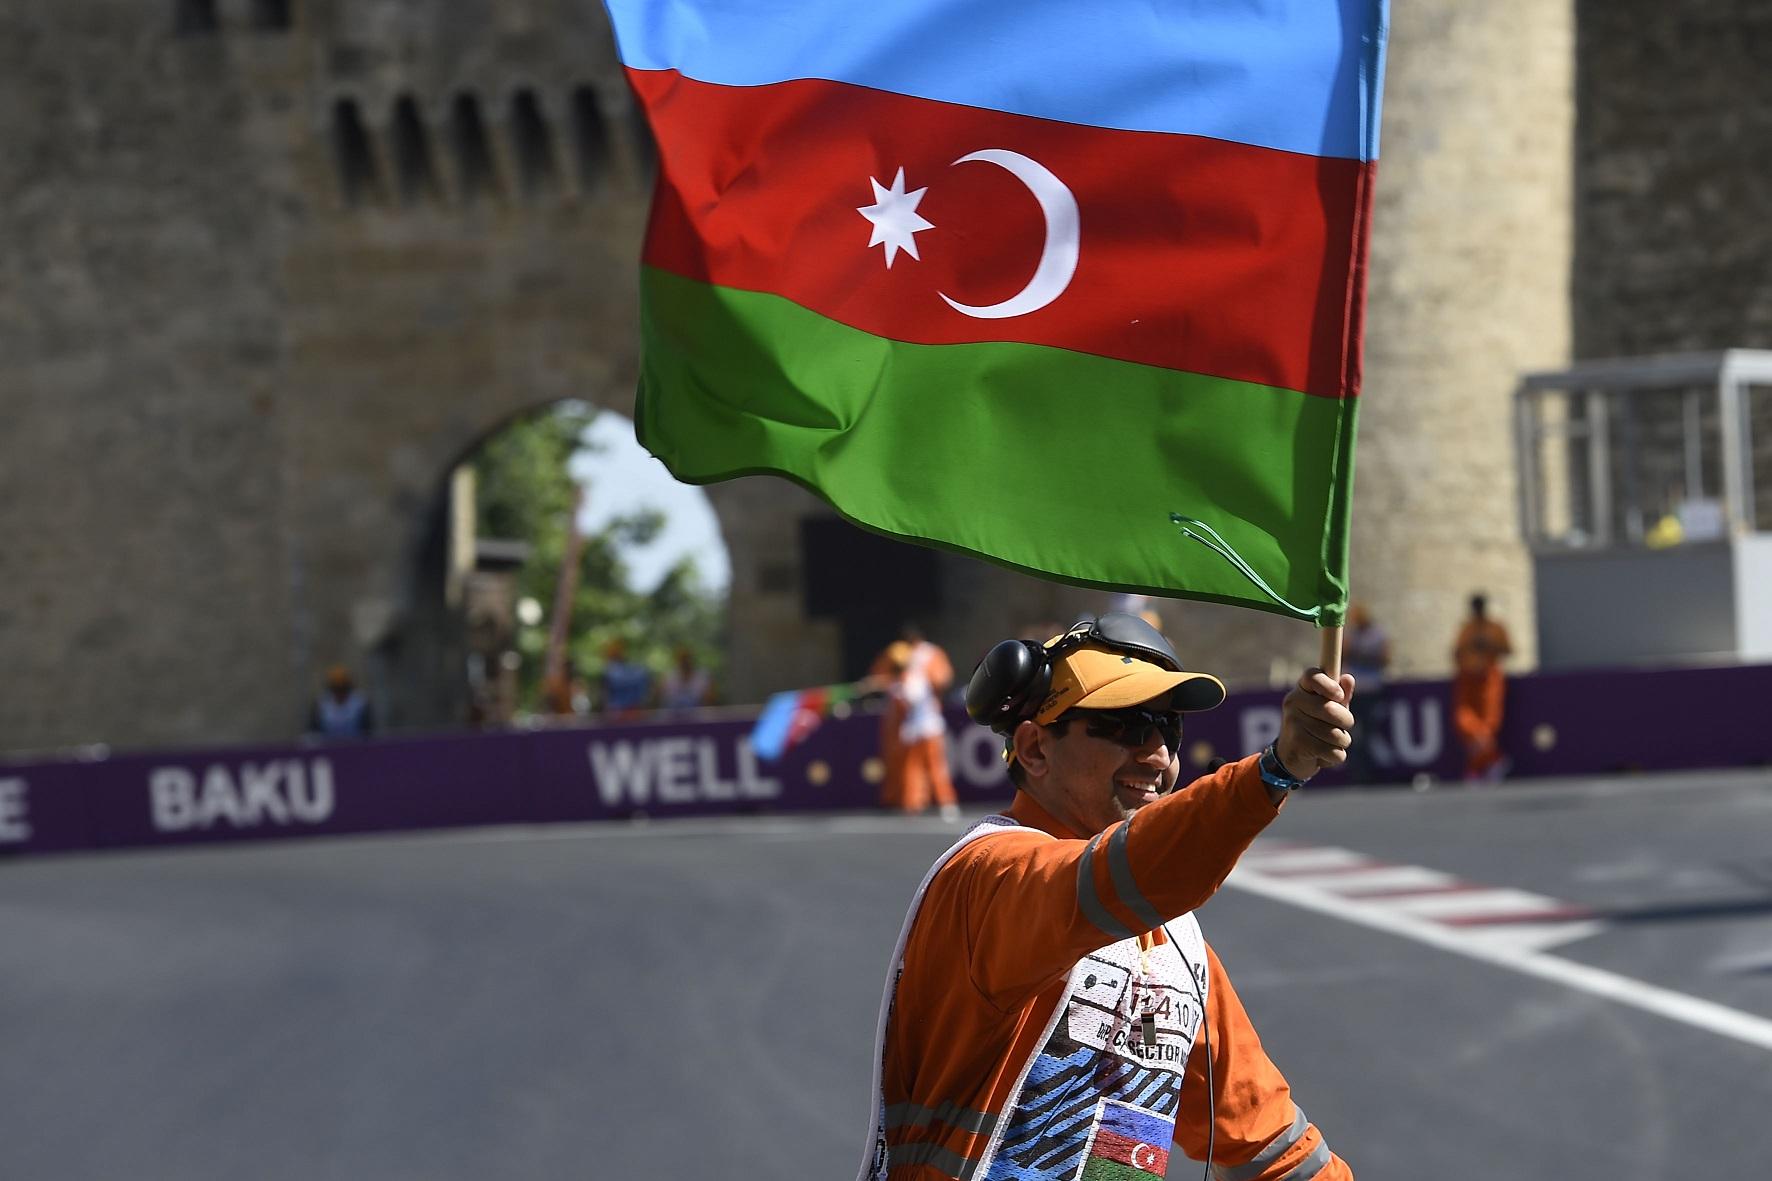 azerflag.JPG